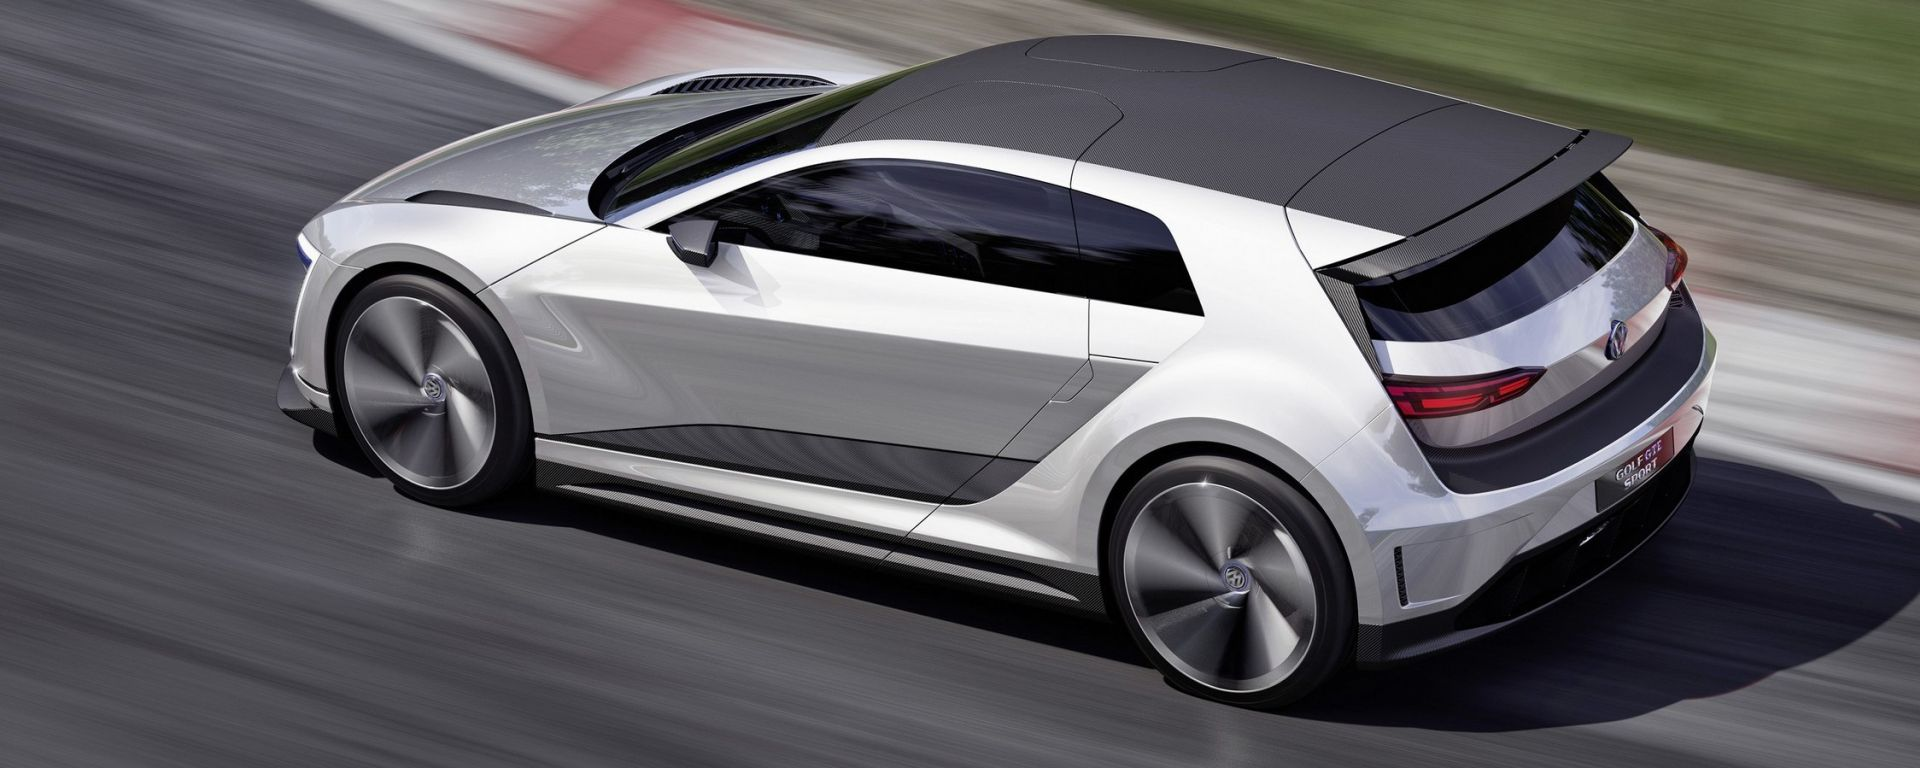 Volkswagen Golf 8: sarà microibrida